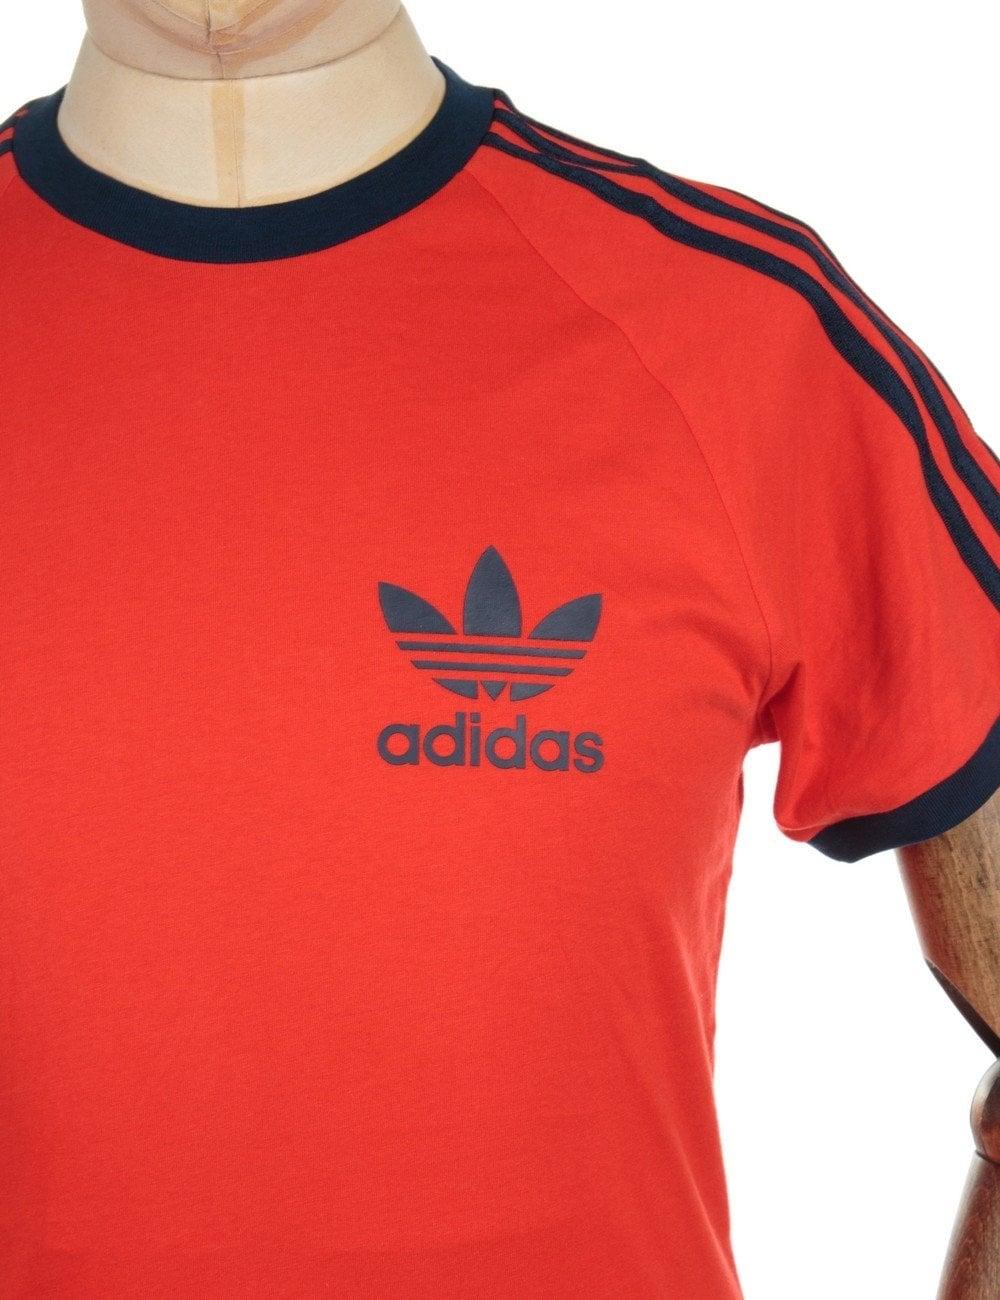 adidas originals trefoil t shirt retro classic